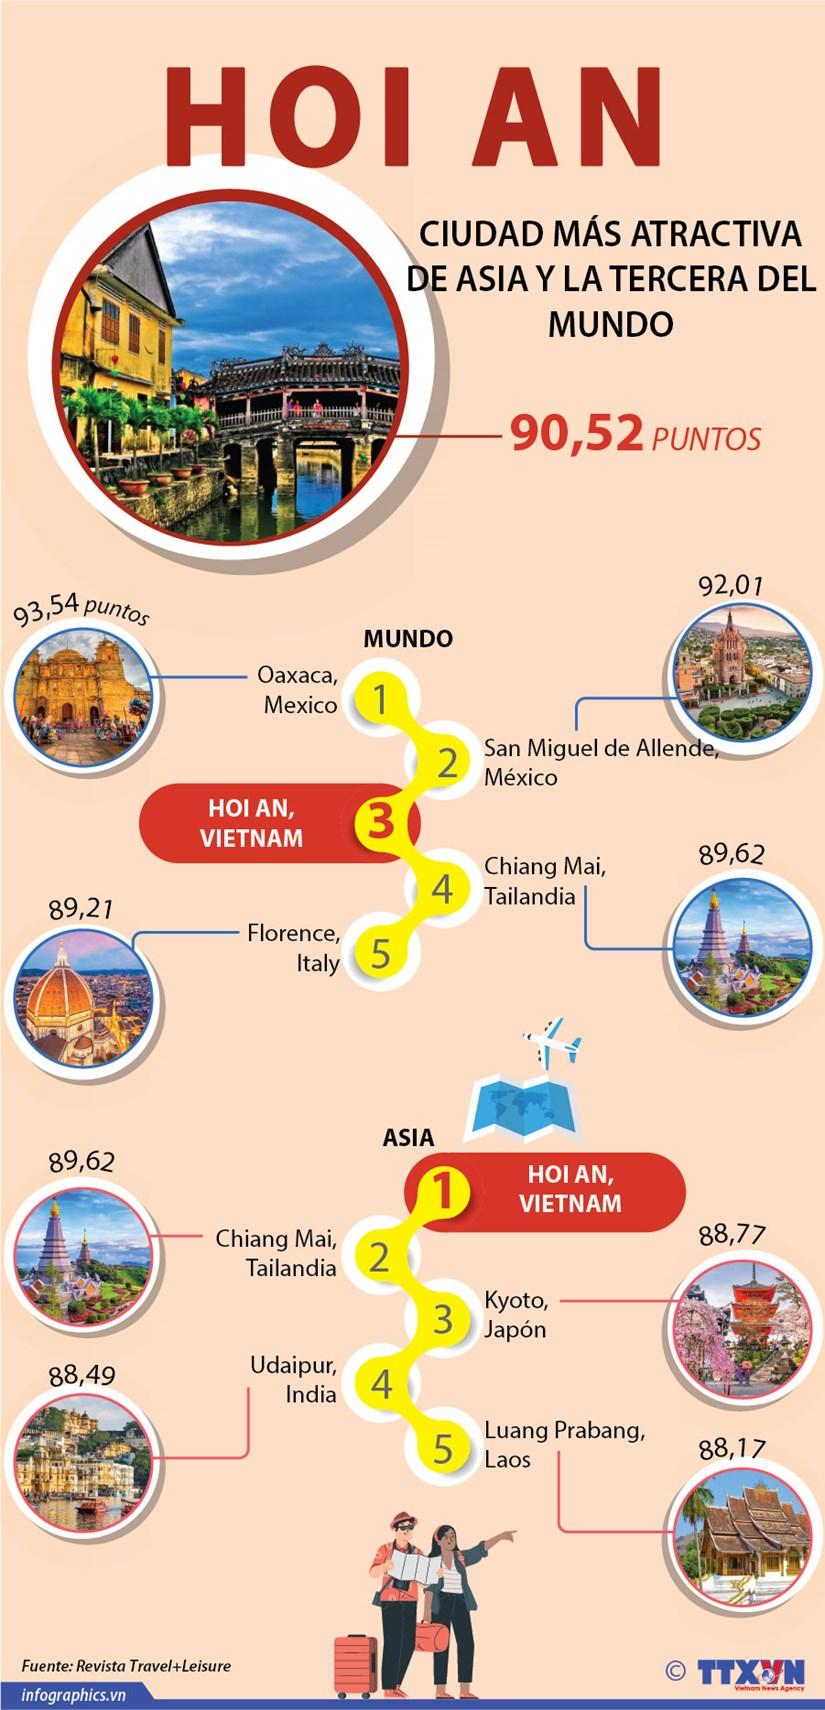 [Info] Hoi An, ciudad mas atractiva de Asia hinh anh 1